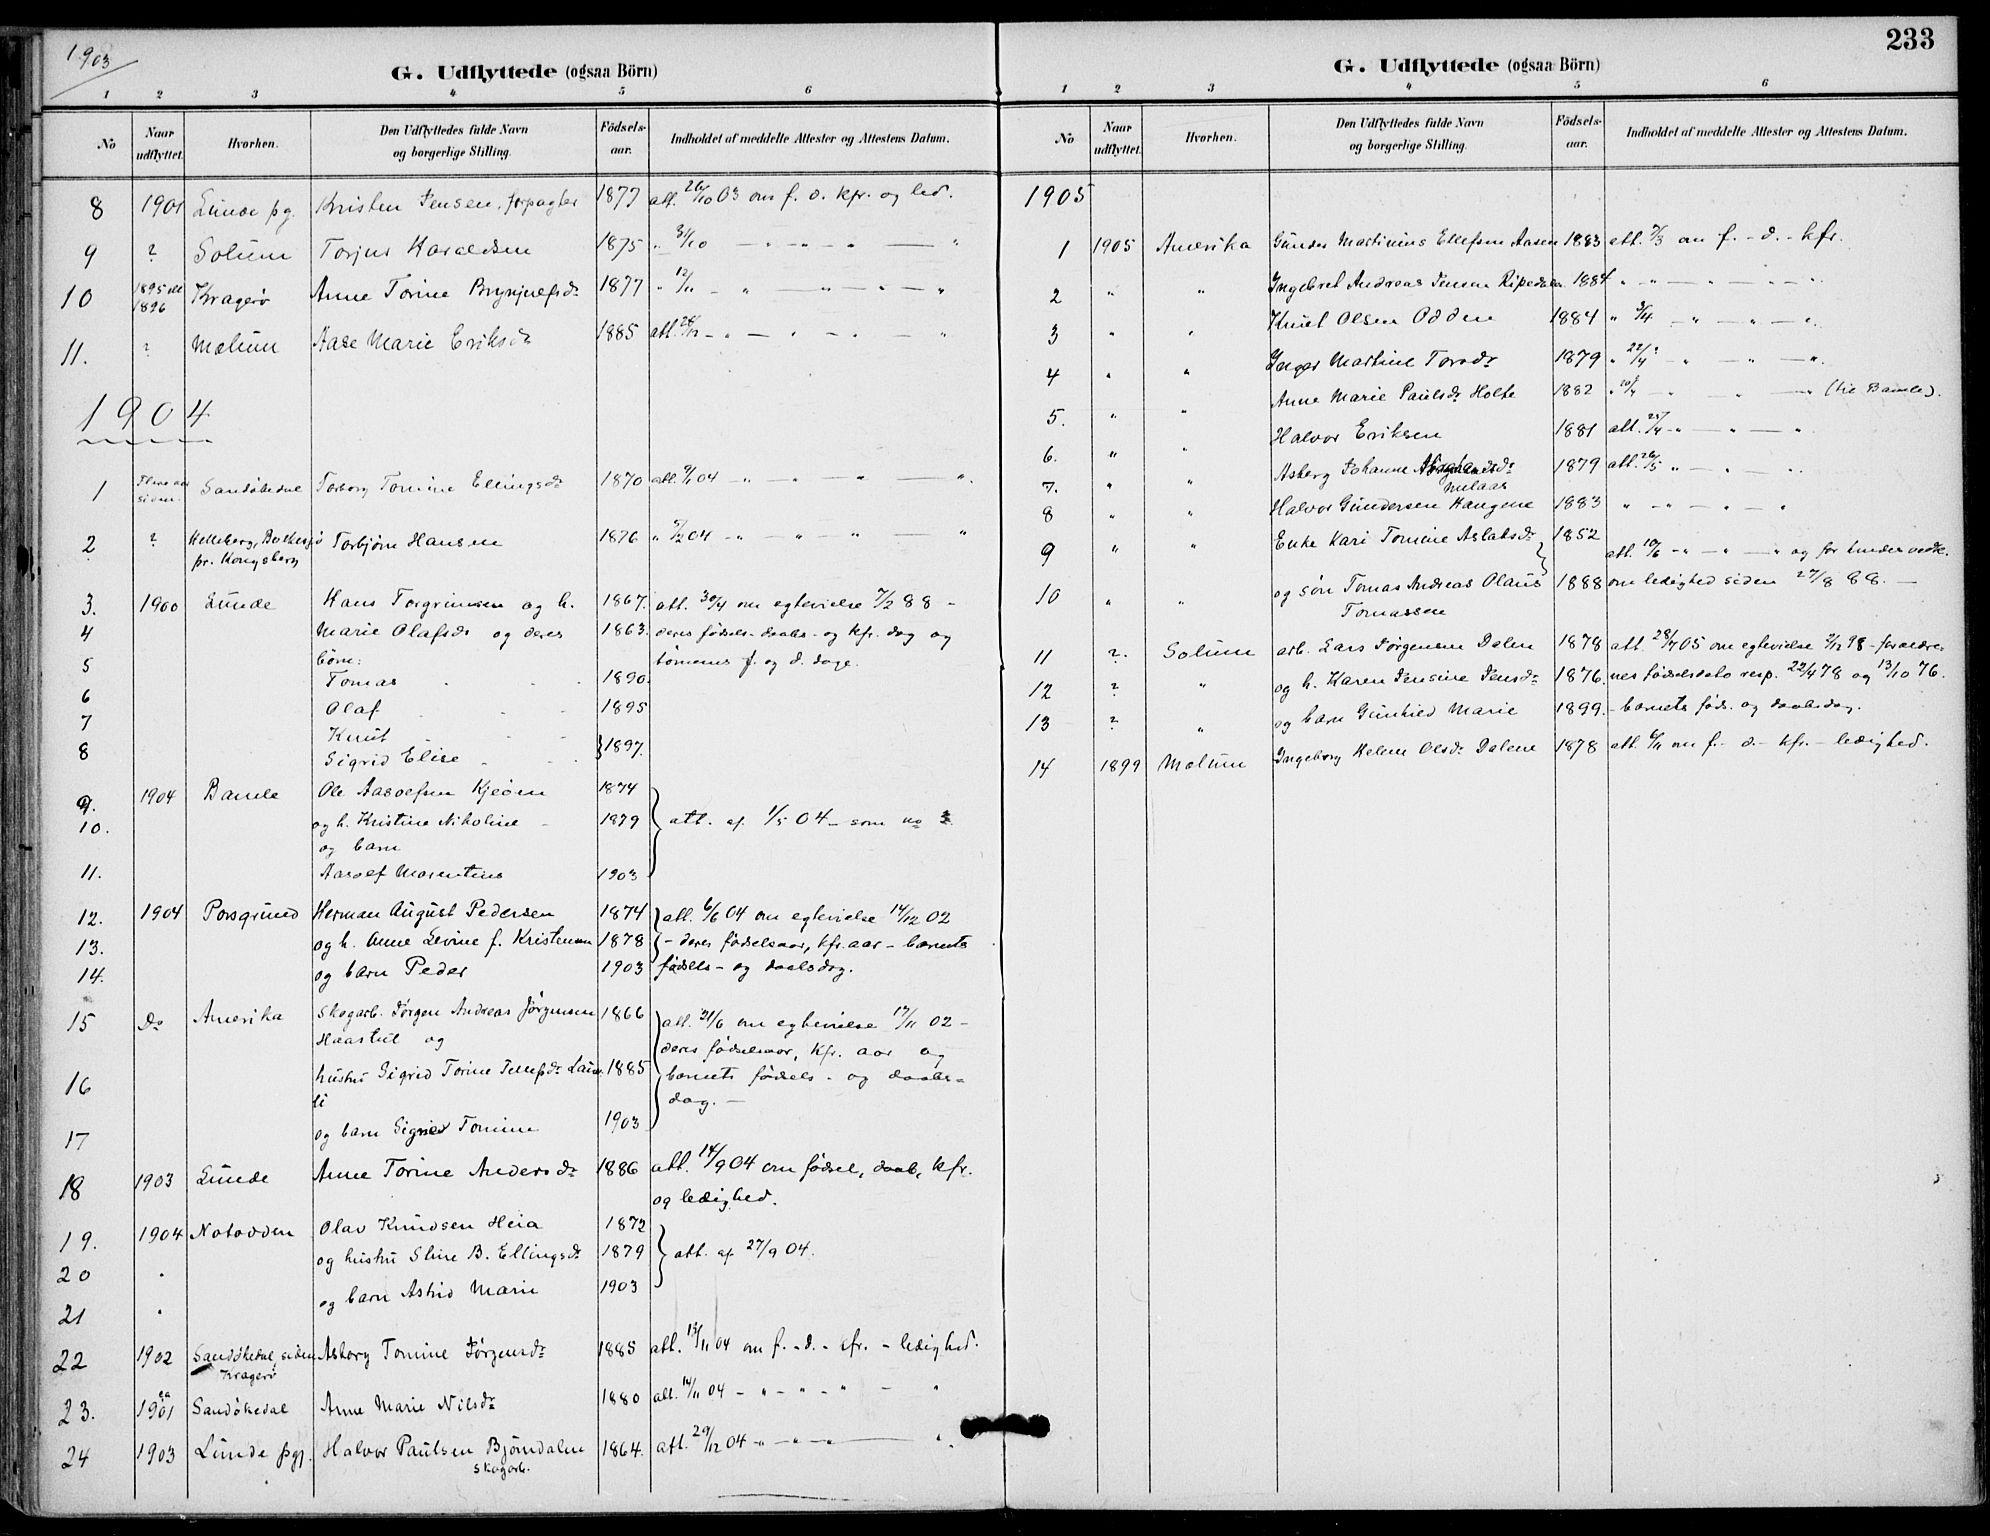 SAKO, Drangedal kirkebøker, F/Fa/L0012: Ministerialbok nr. 12, 1895-1905, s. 233